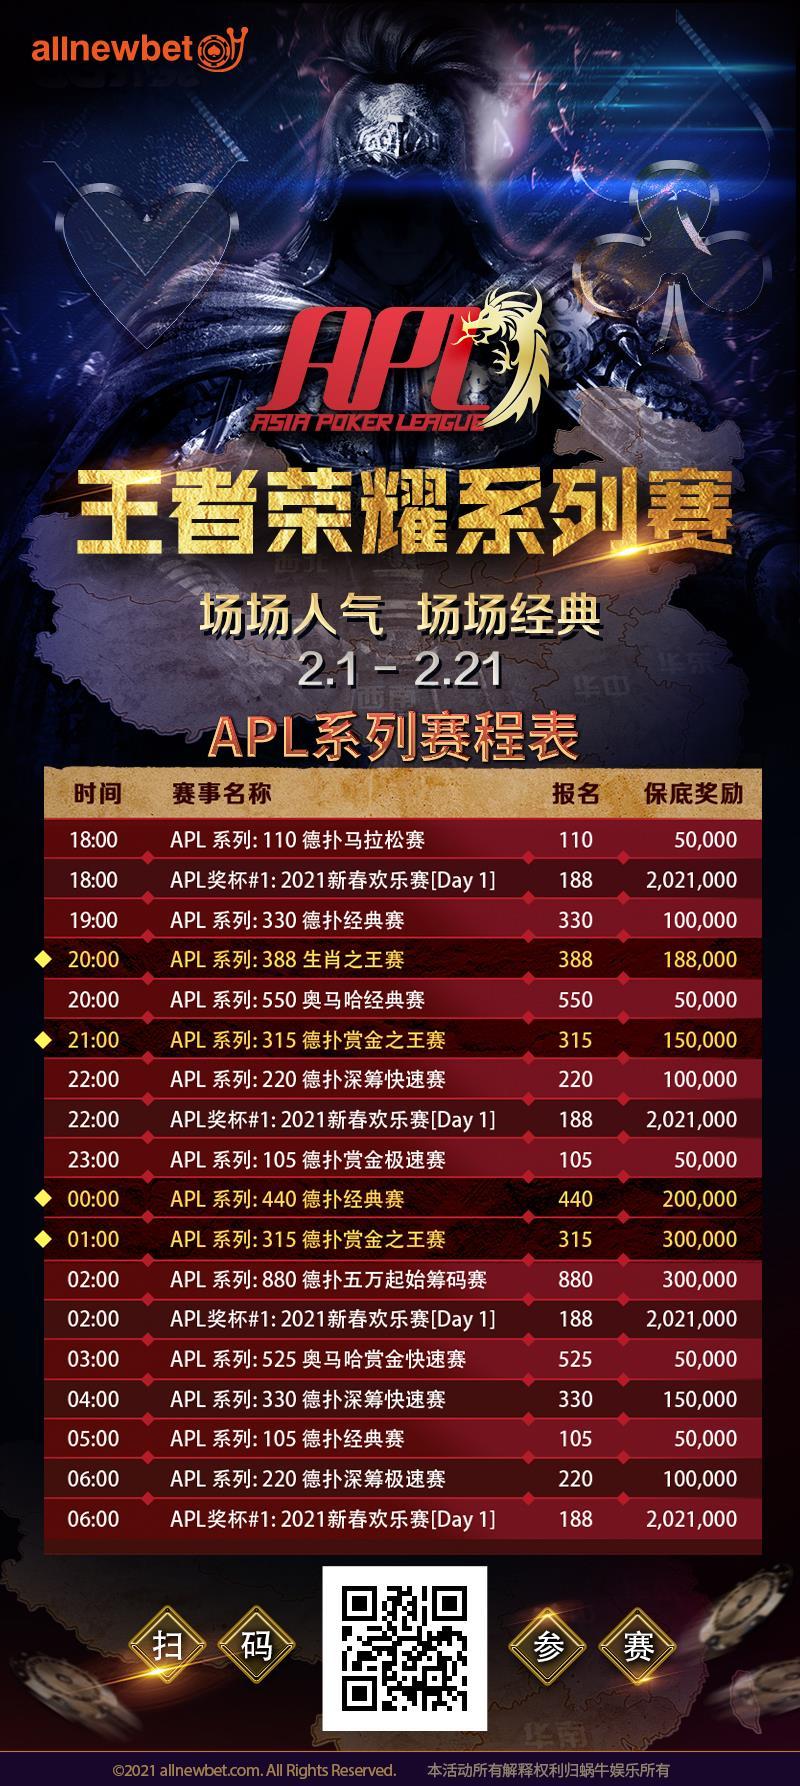 【GG扑克】除了8千万保底~APL最近在红什么? 小编的独创介绍 (警告: 内有海量美女图)